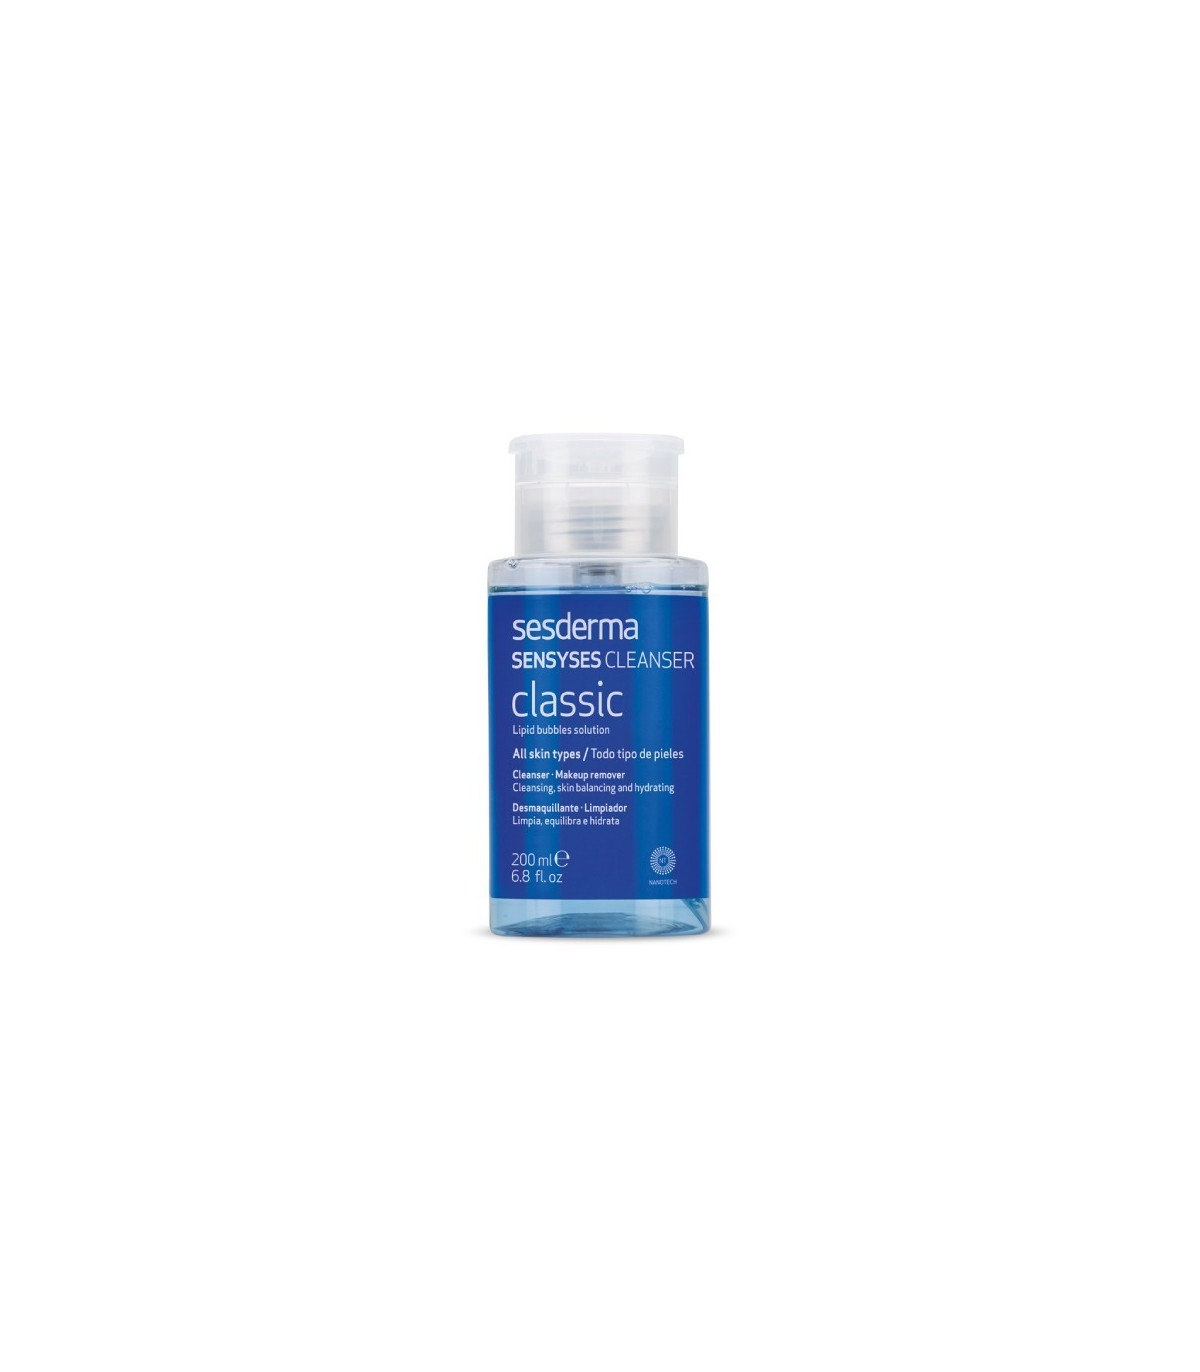 Farmacia Baricentro SESDERMA SENSYSES CLEANSER CLASSIC 200 ML